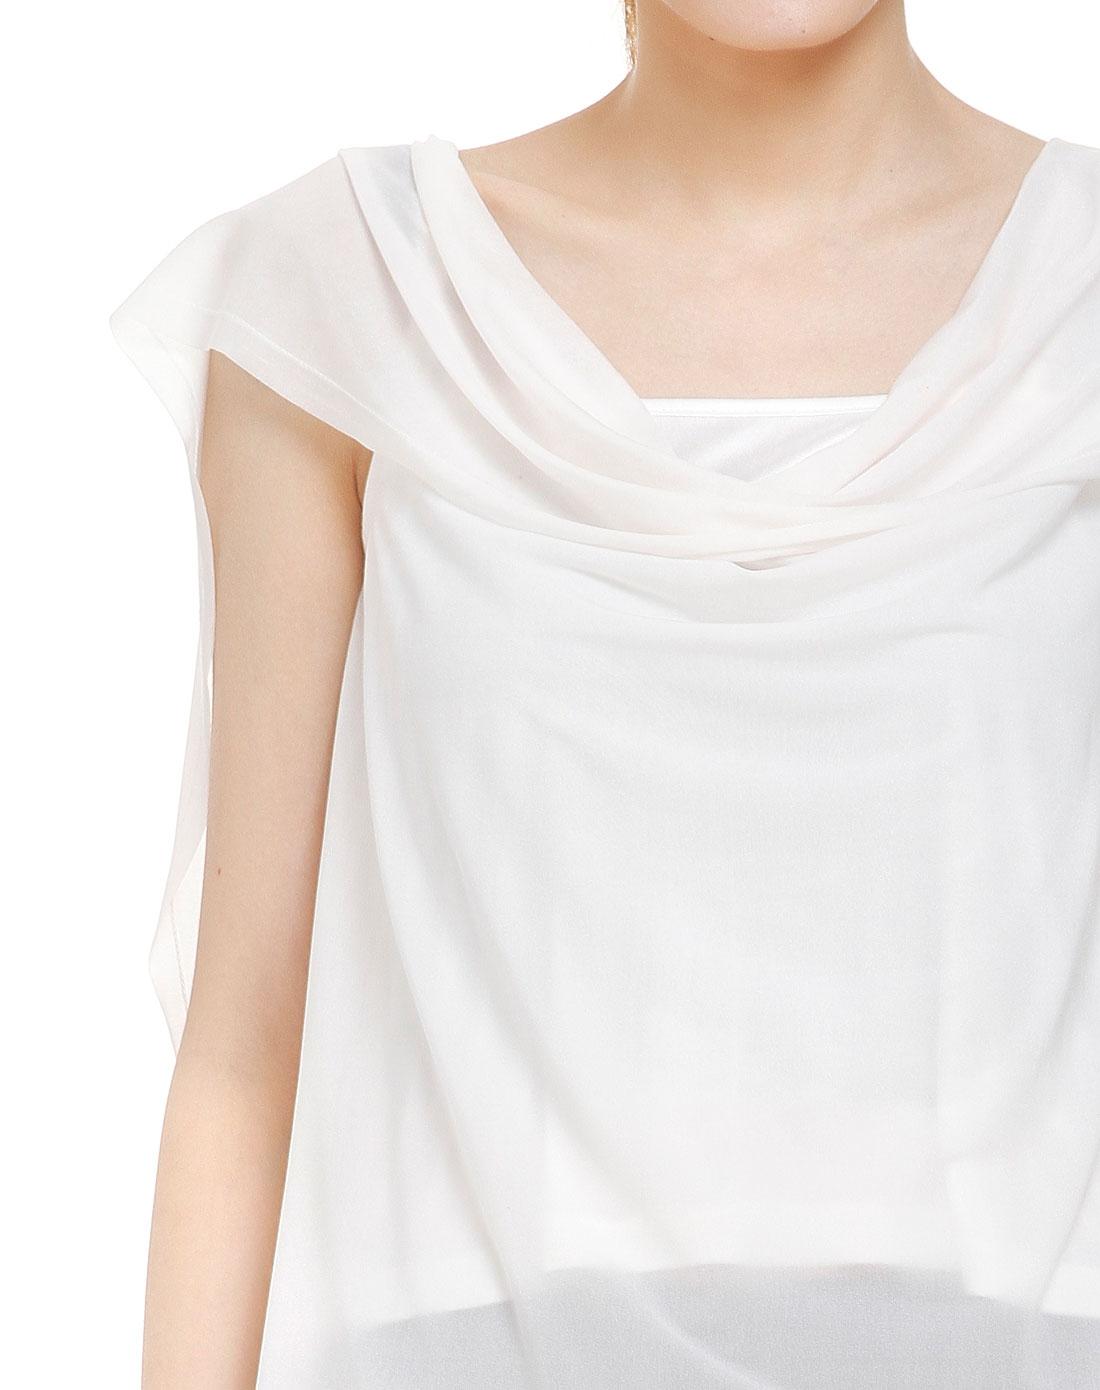 grant白色结构设计特色盖肩袖衬衫两件套gc